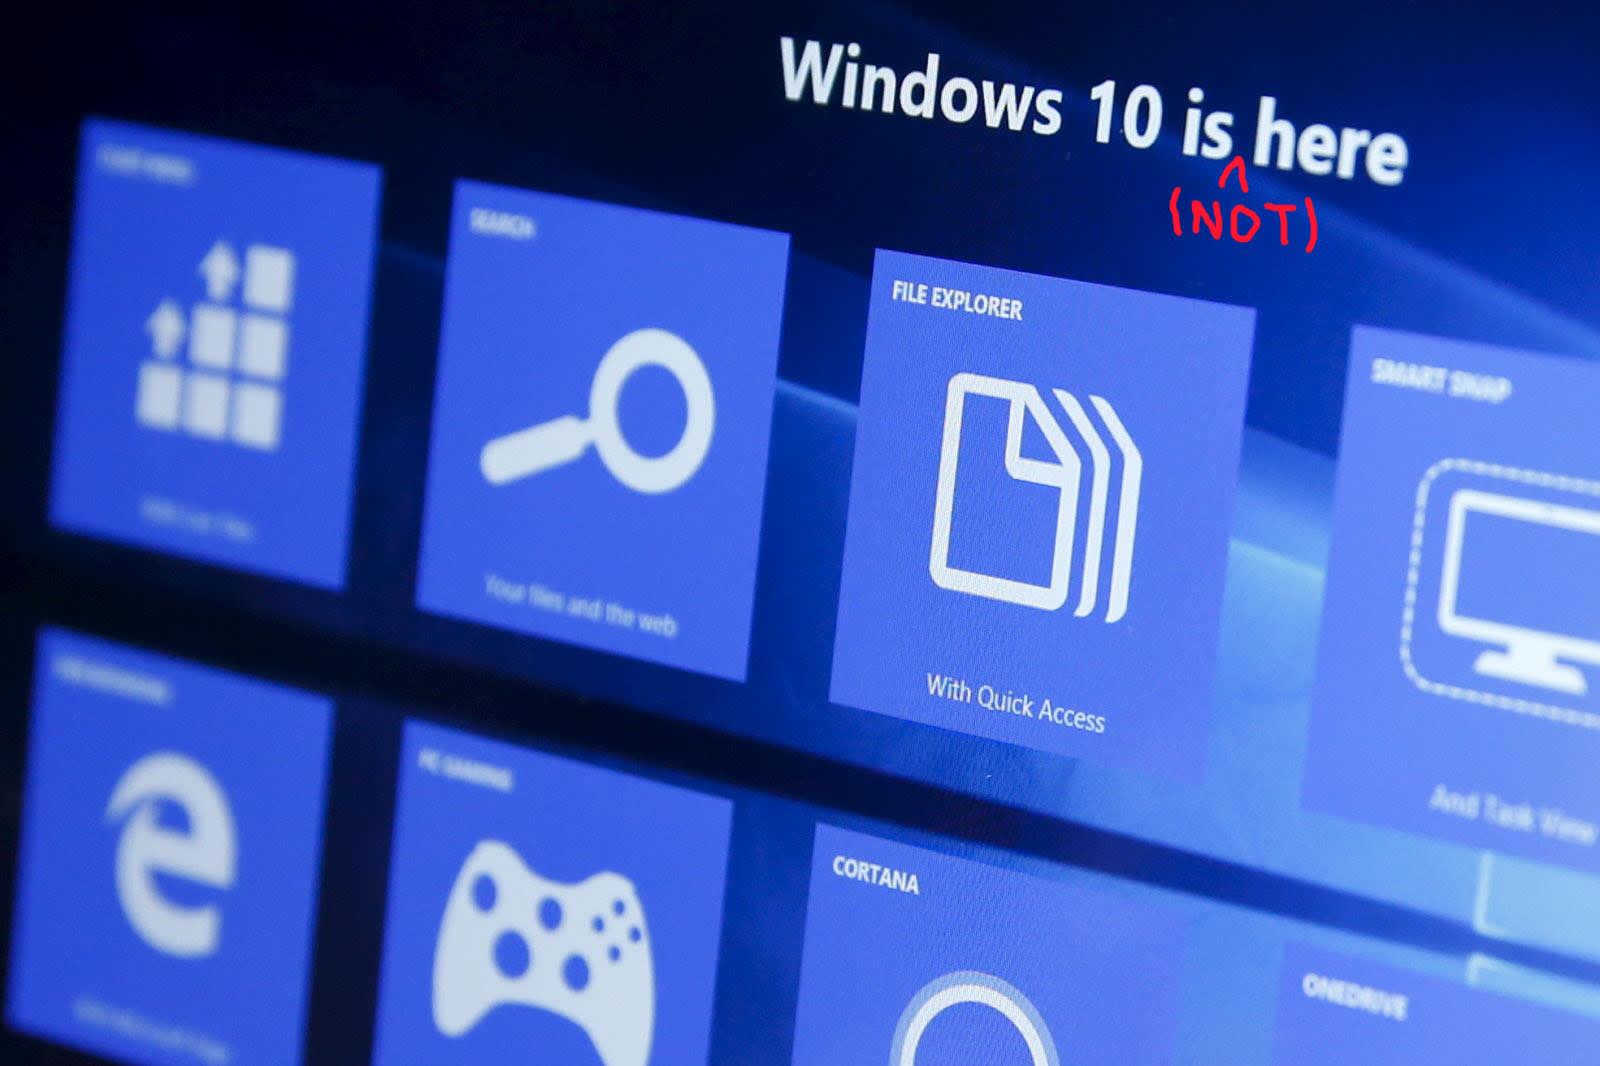 microsoft no more windows 10 upgrades for some atom based pcs